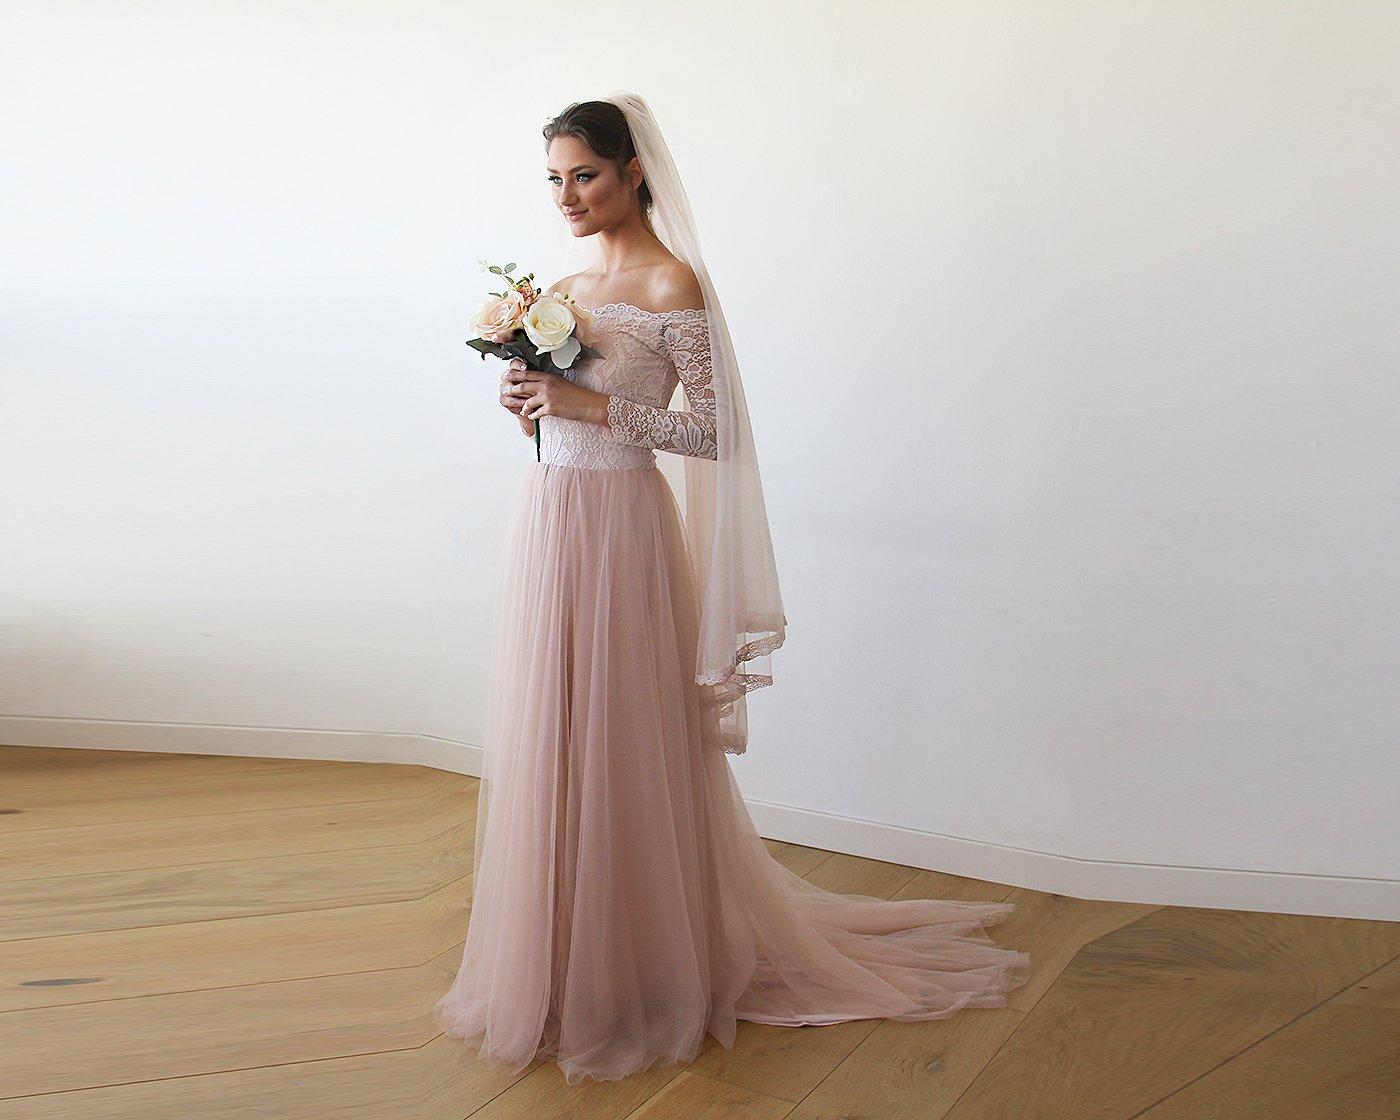 Wedding Dresses Archives - Cute Dresses